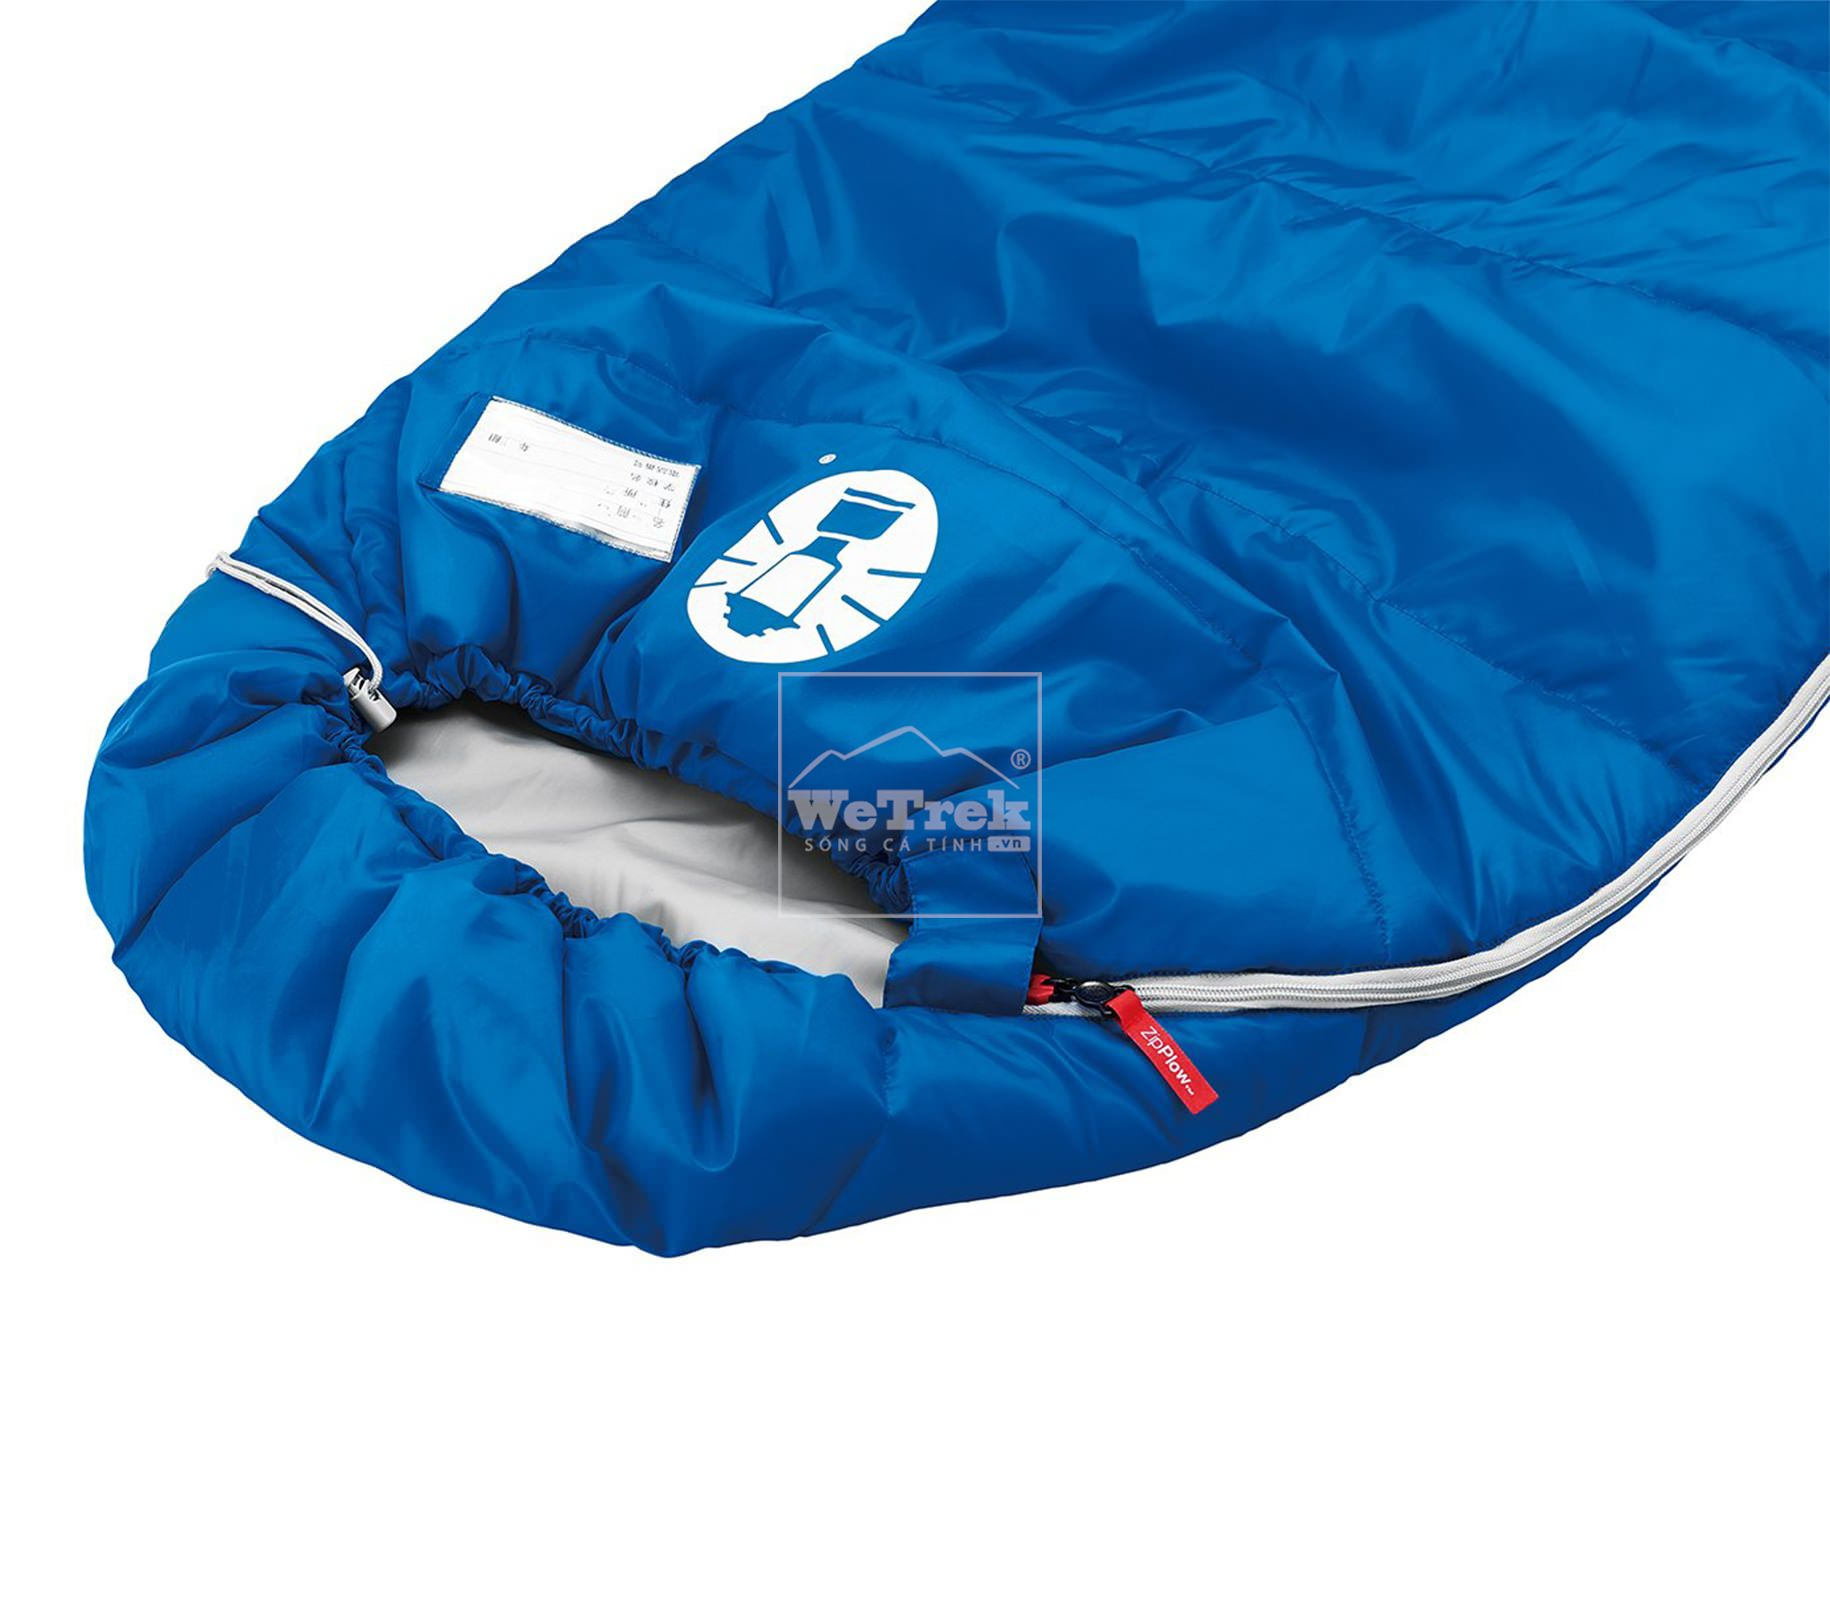 tui-ngu-tre-em-coleman-school-kid-blue-2000027268-7464-wetrek.vn-1